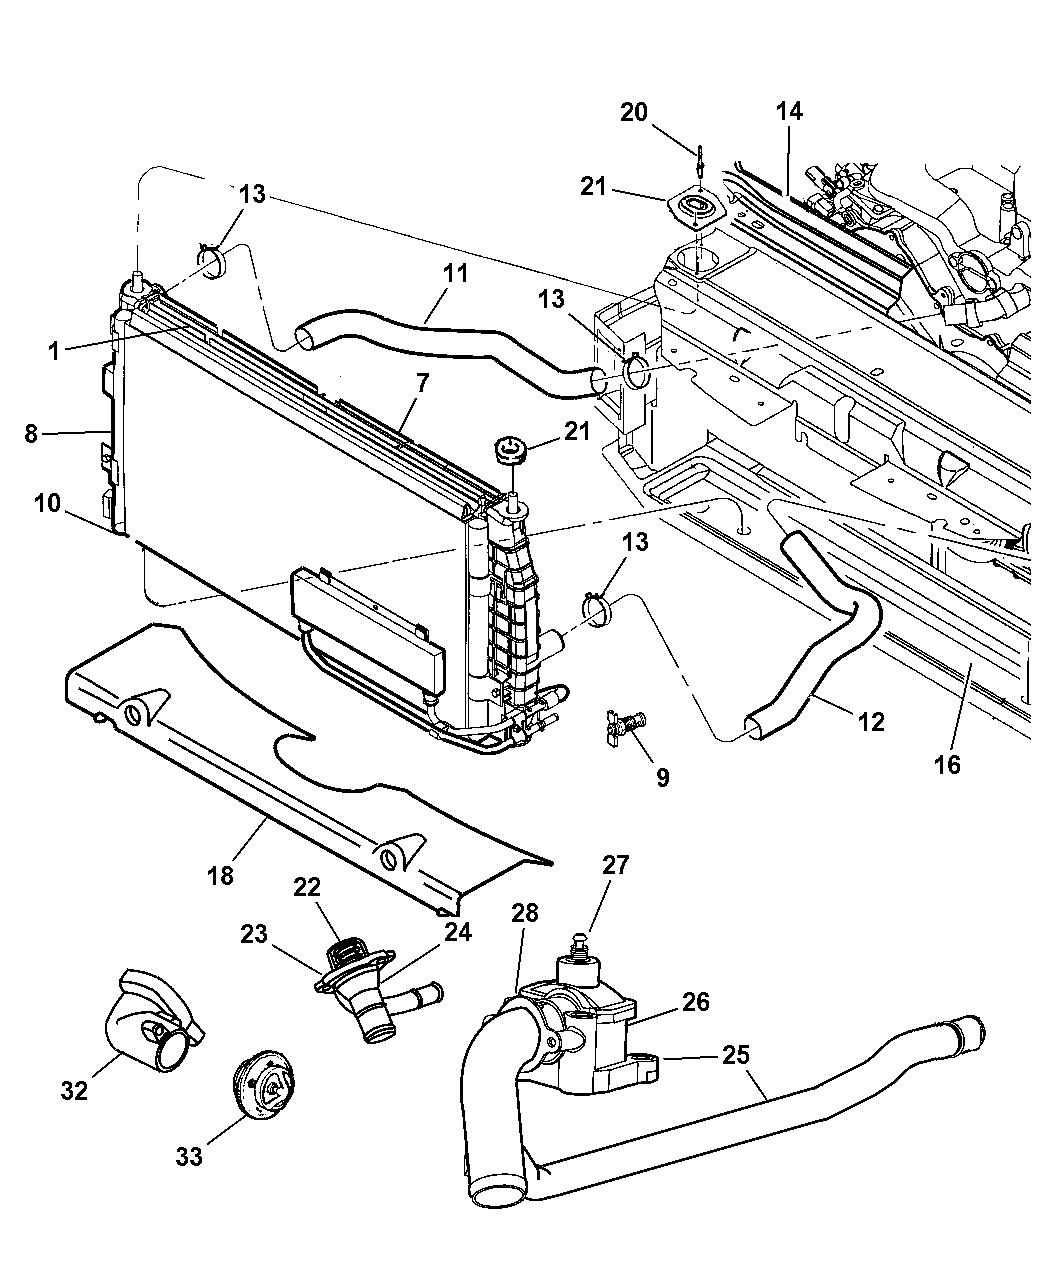 1999 Dodge Intrepid Radiator Related Parts